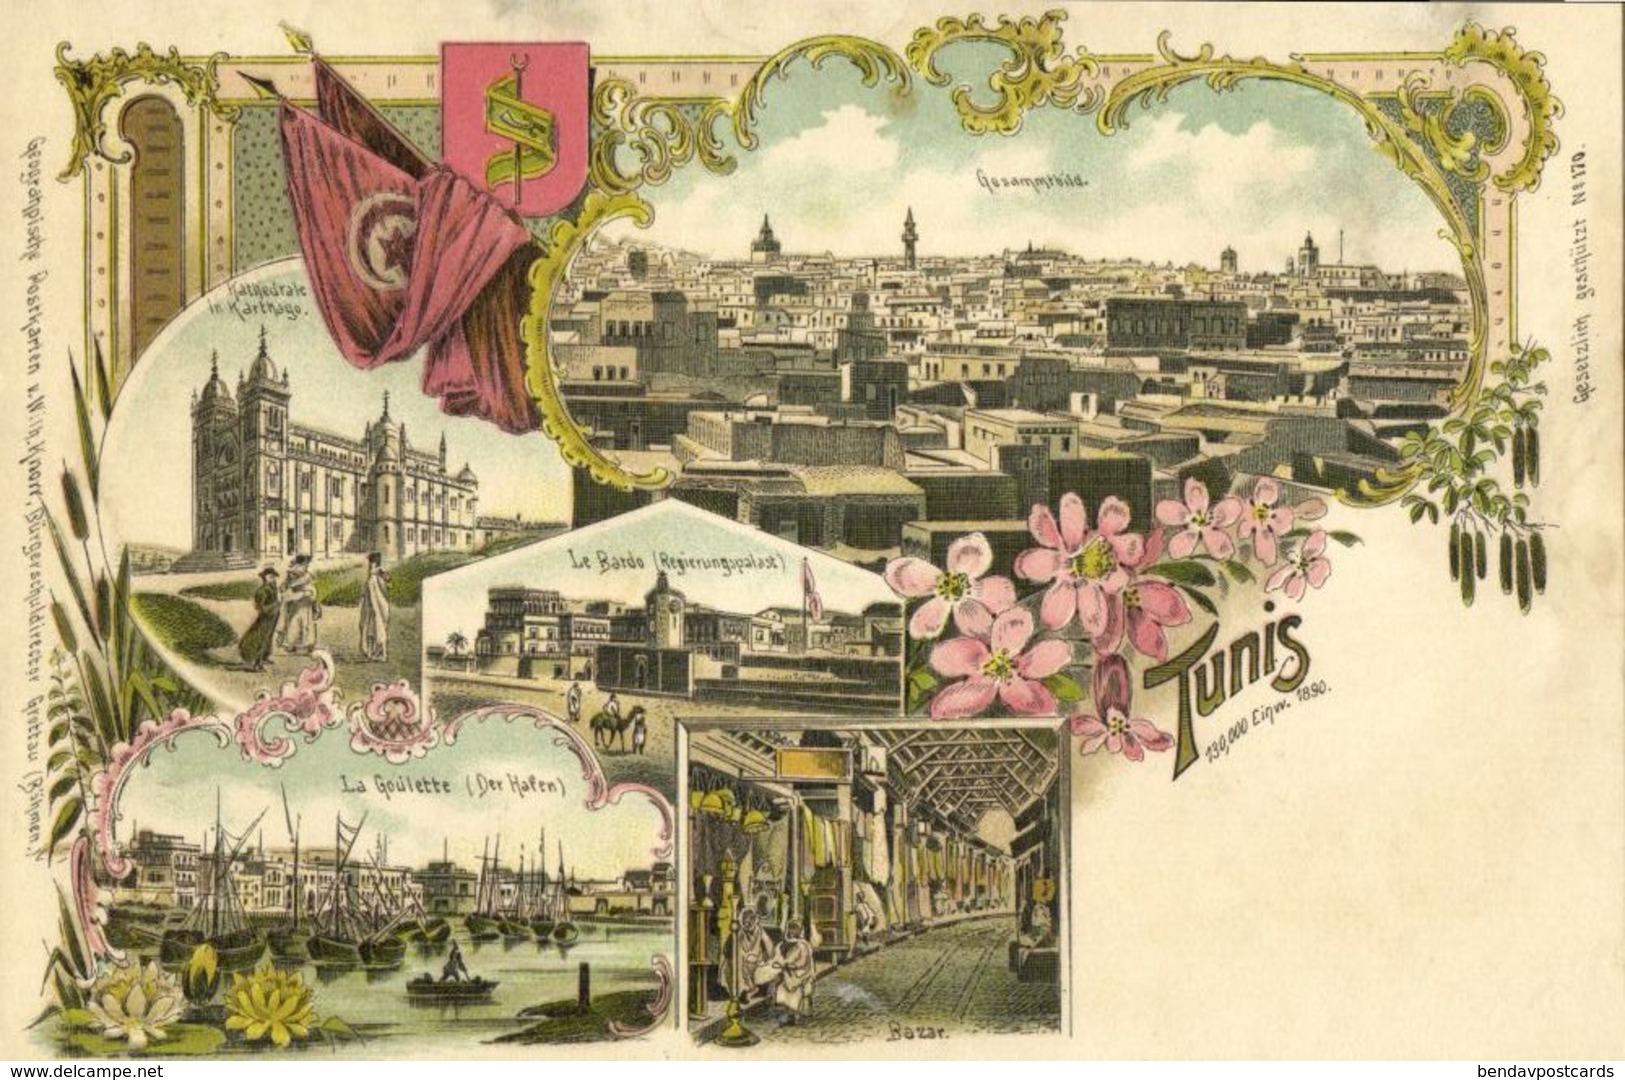 Tunisia, TUNIS, Cathedral, Bazar, Harbour, Flag (1899) Multiview Litho Postcard - Tunisia